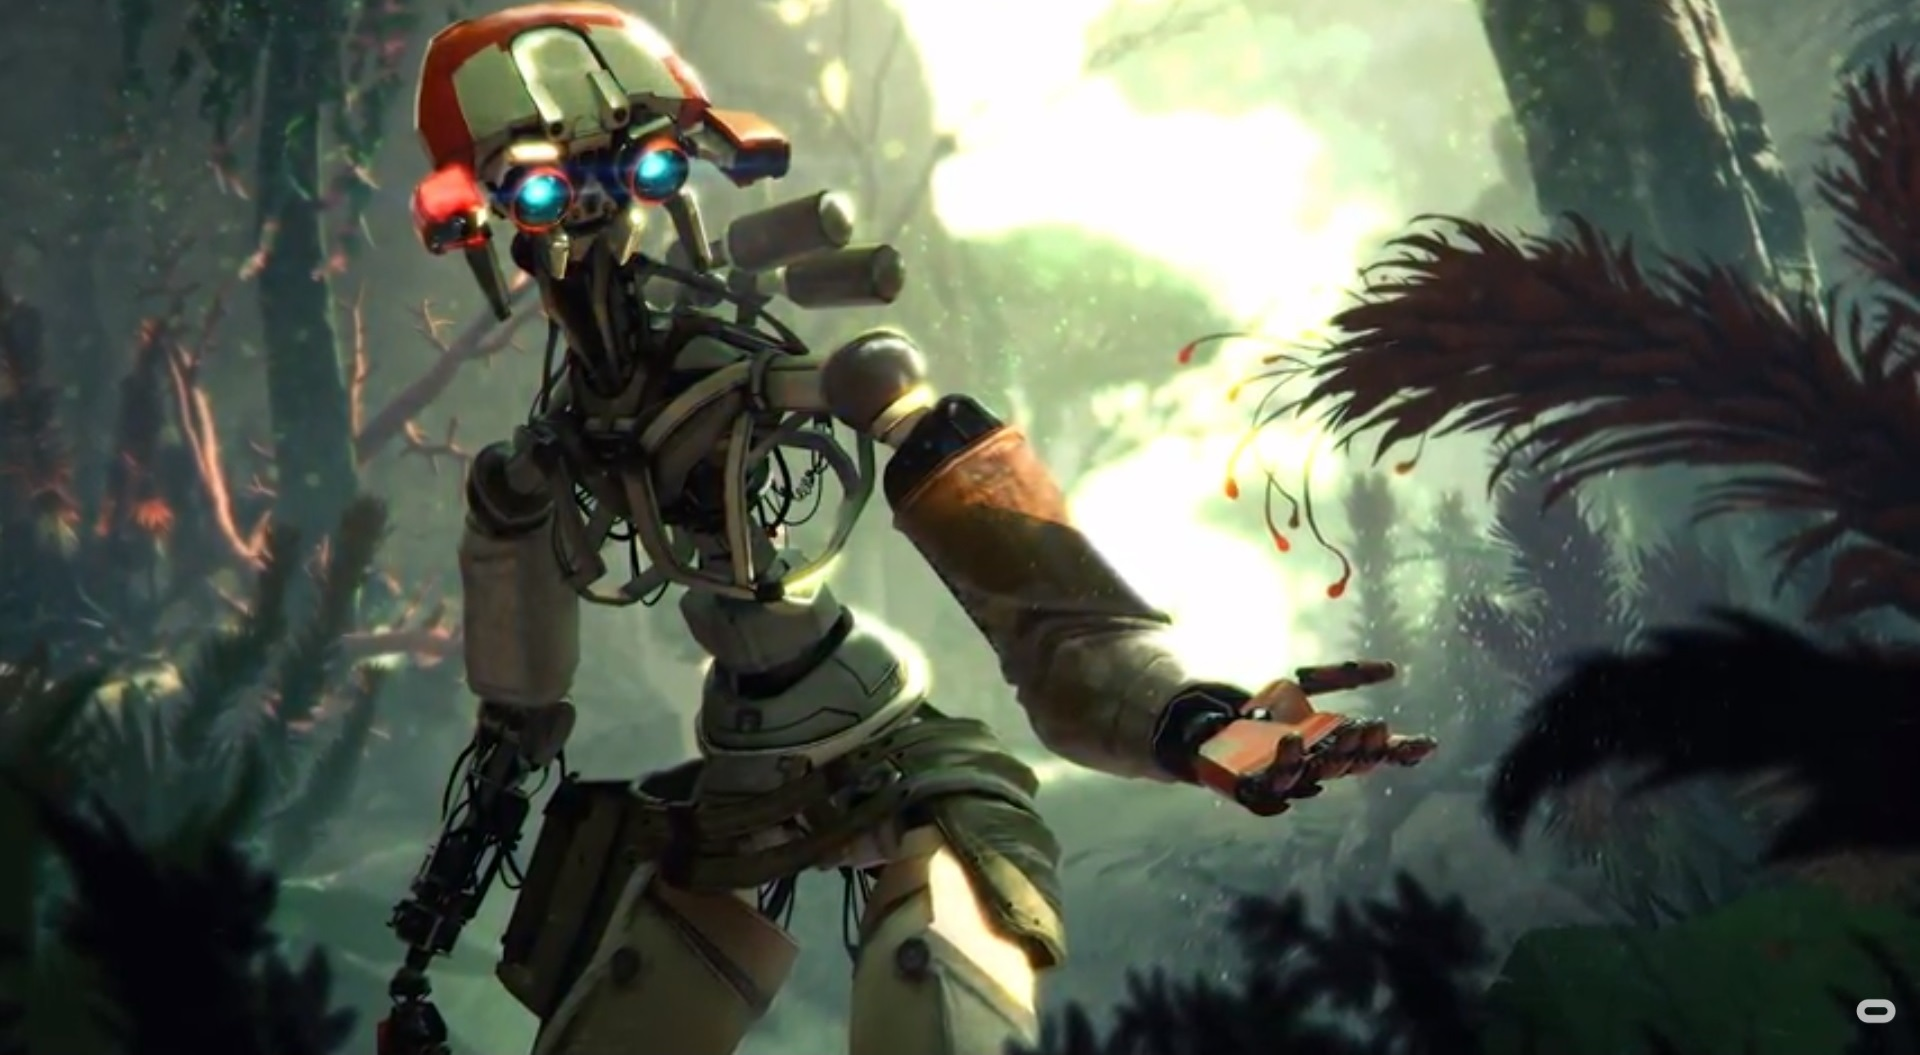 Insomniac's newest game will get revealed next week screenshot